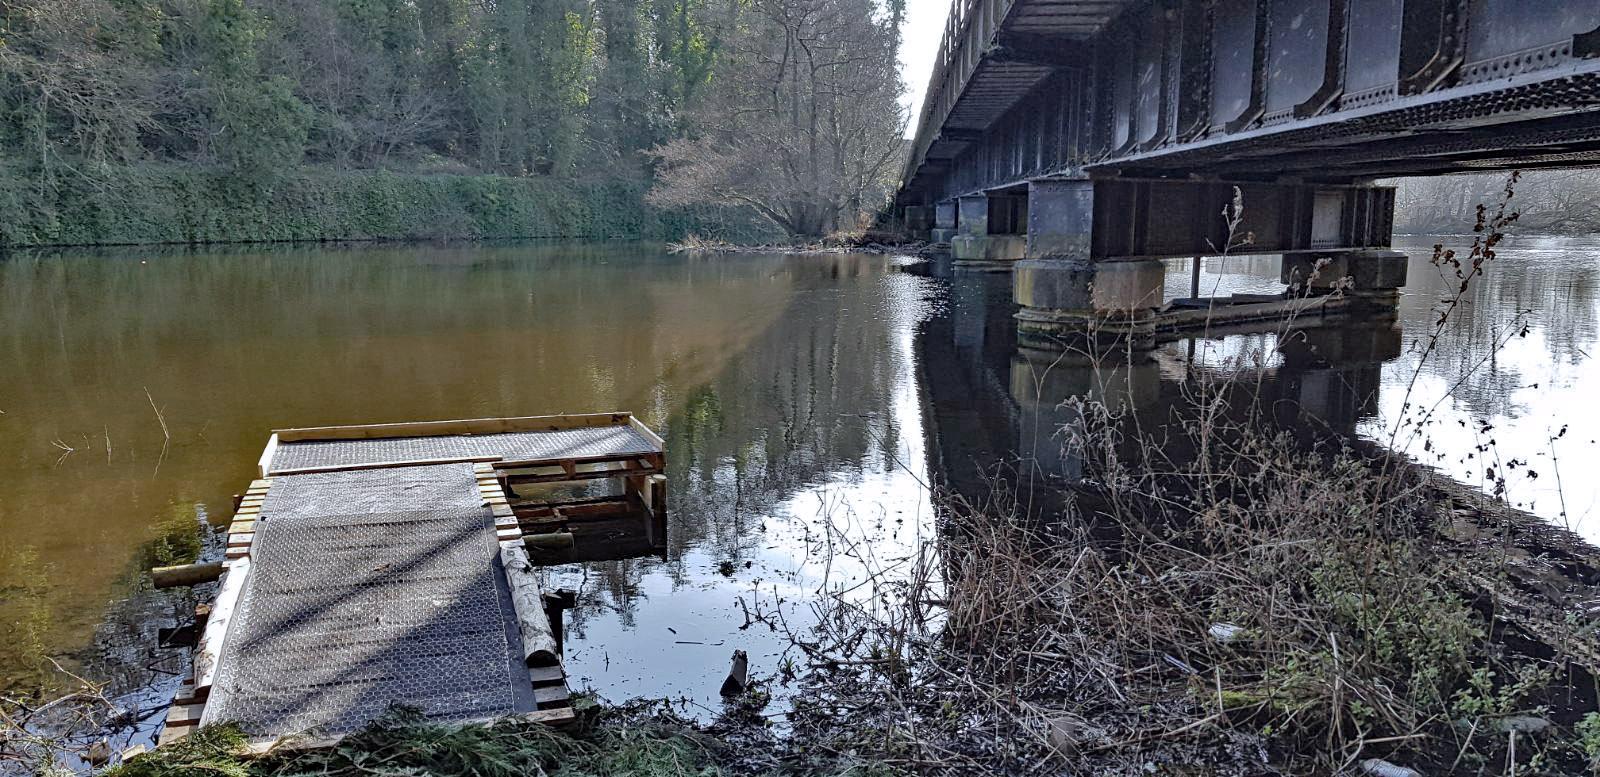 Fishing peg improvement work on the River Derwent at Belper